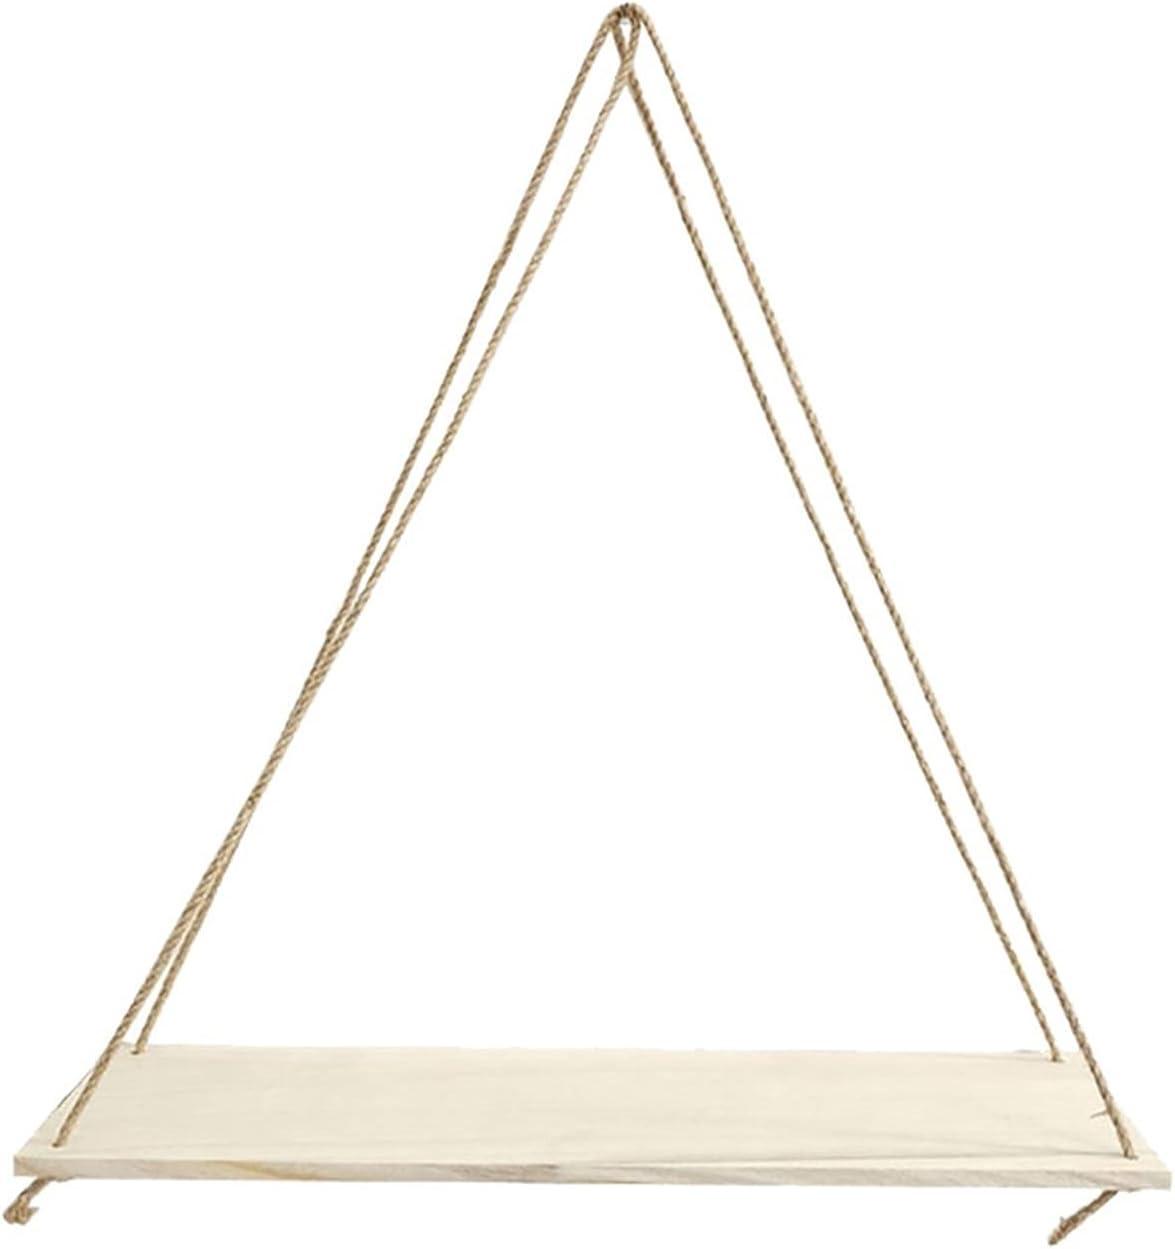 Regular discount LQHZ Wall Shelf Storage Ranking TOP4 Premium Swing Hanging Rope Wa Wood